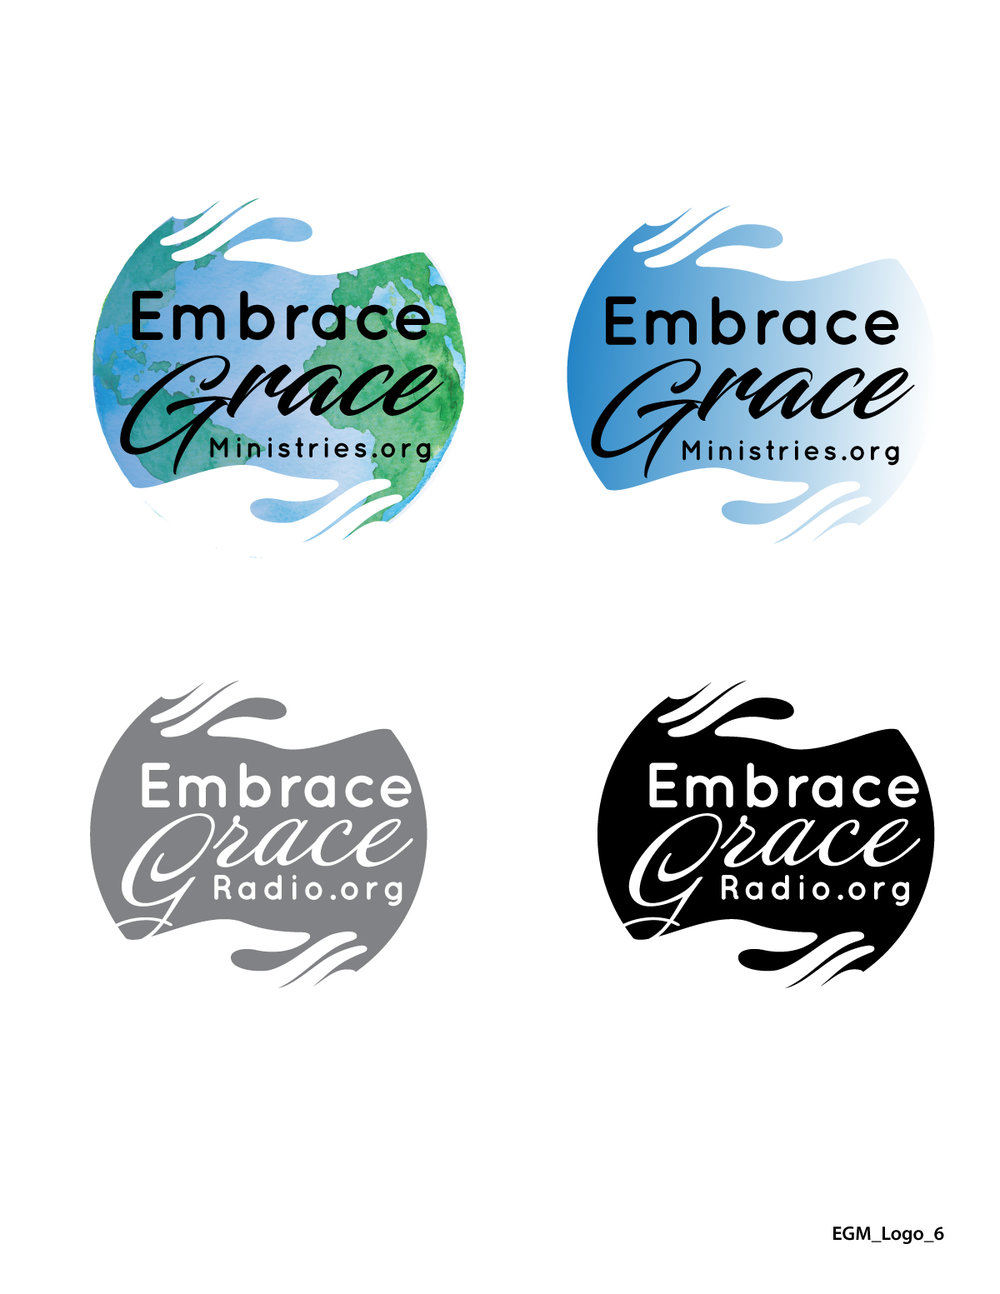 EGM_Logo_6.jpg